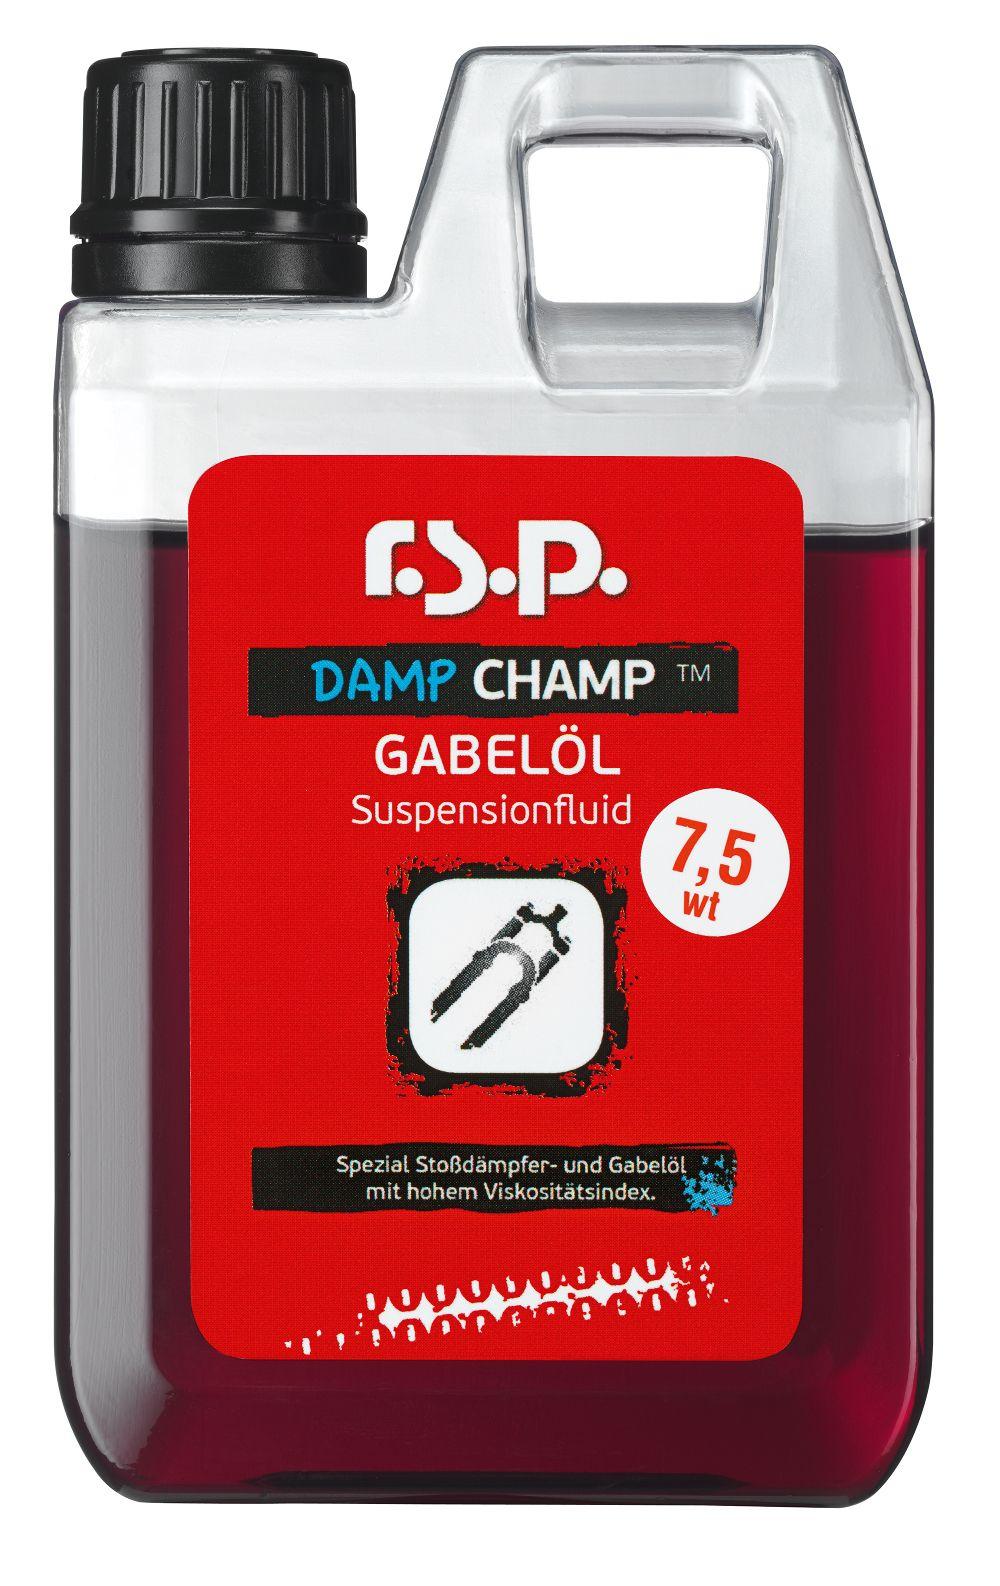 Huile fourche r.s.p. Damp Champ 7.5wt 1 L